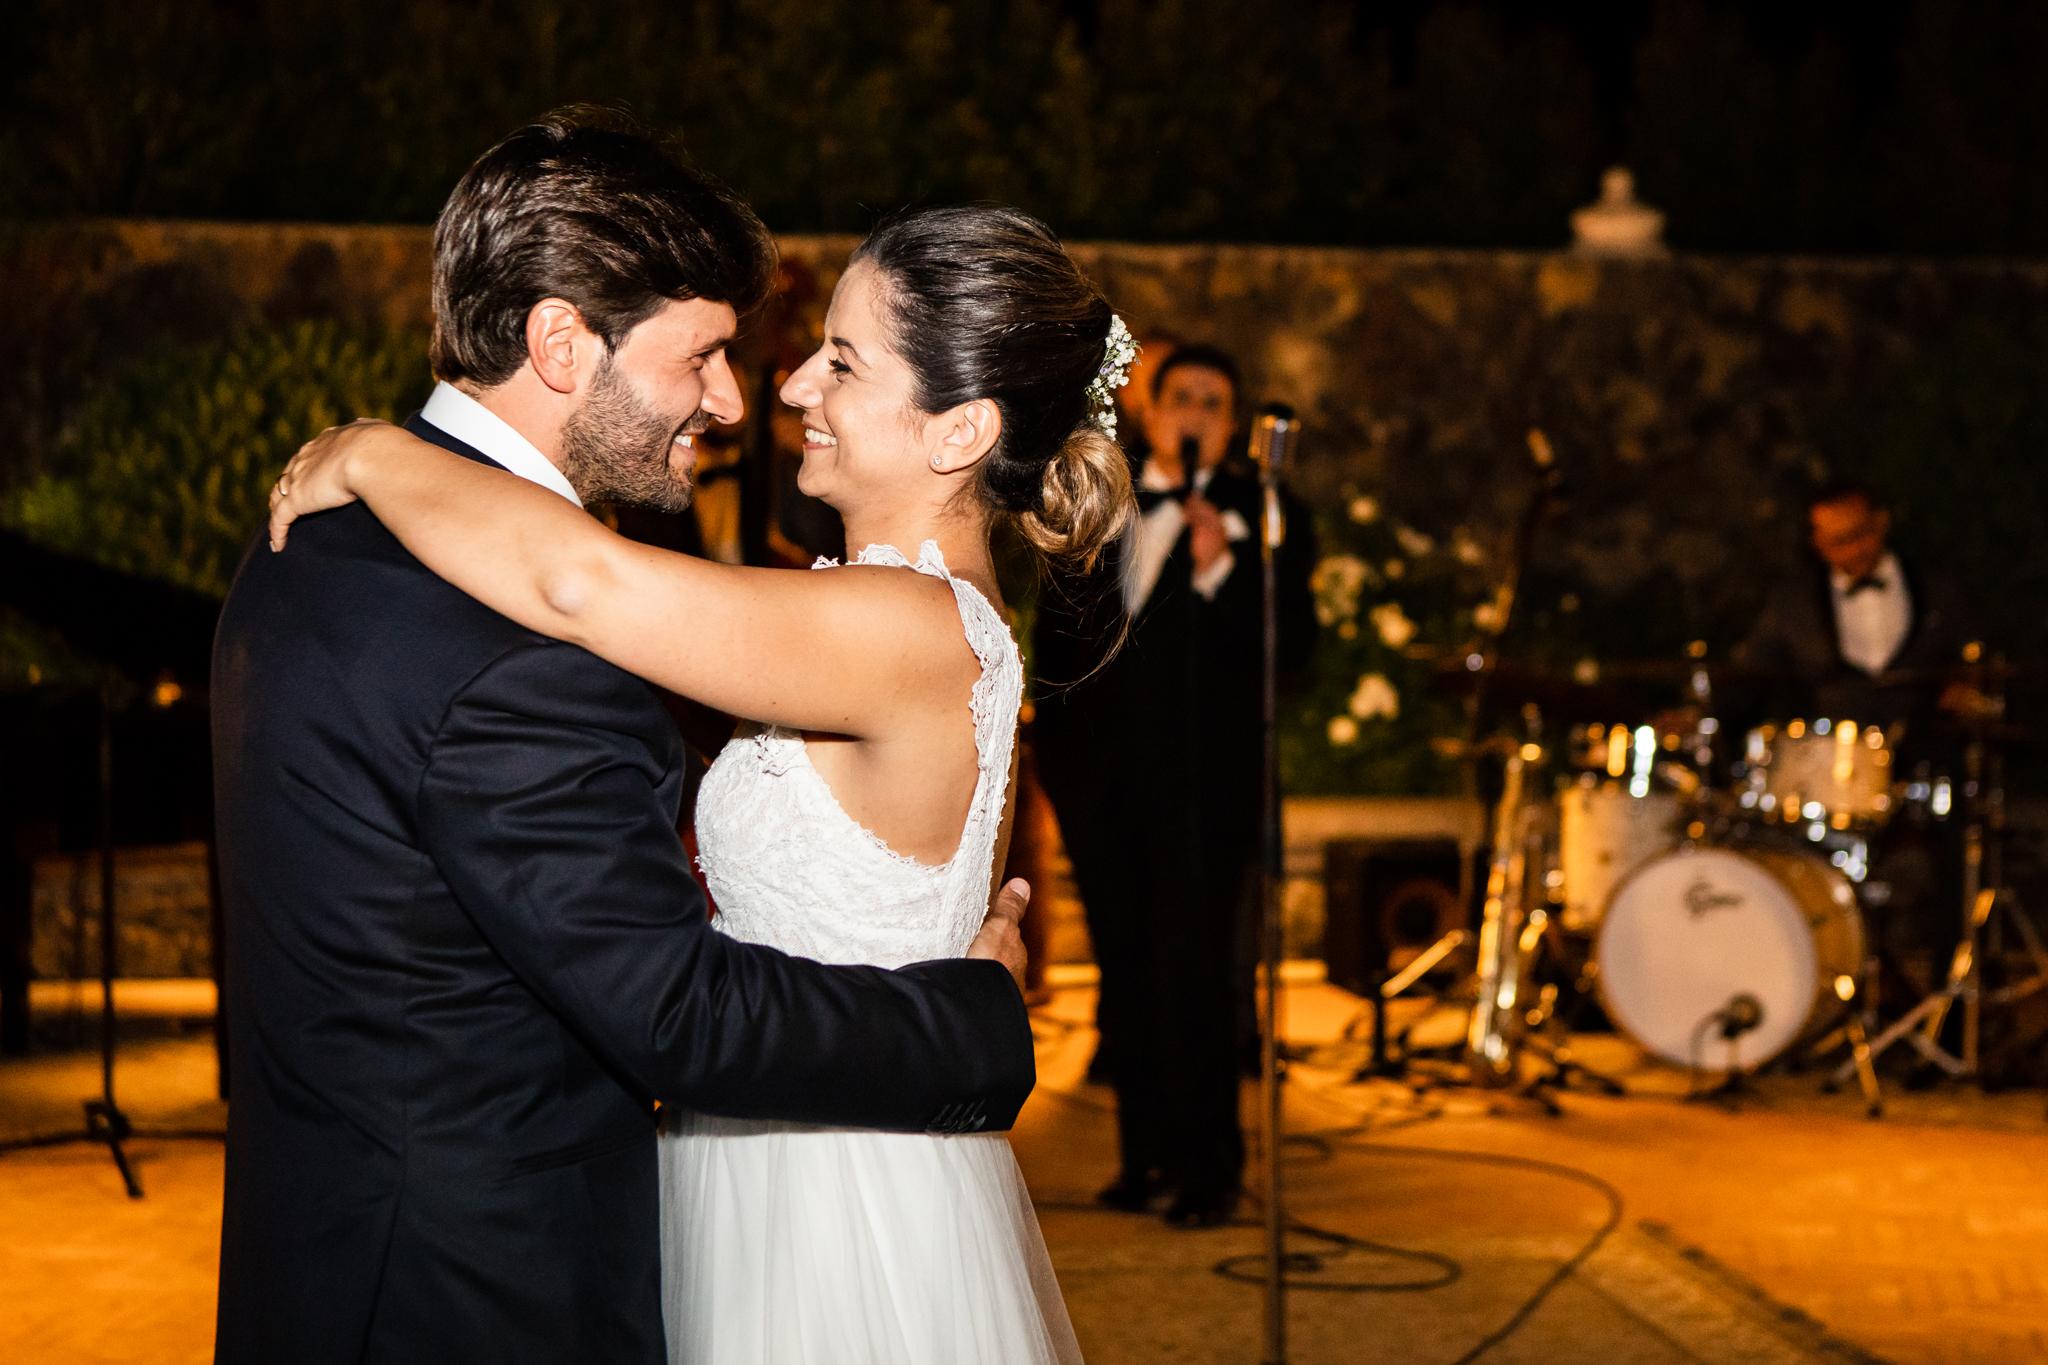 Fotografo-matrimonio-reportage-Sicilia-Catania-40.jpg